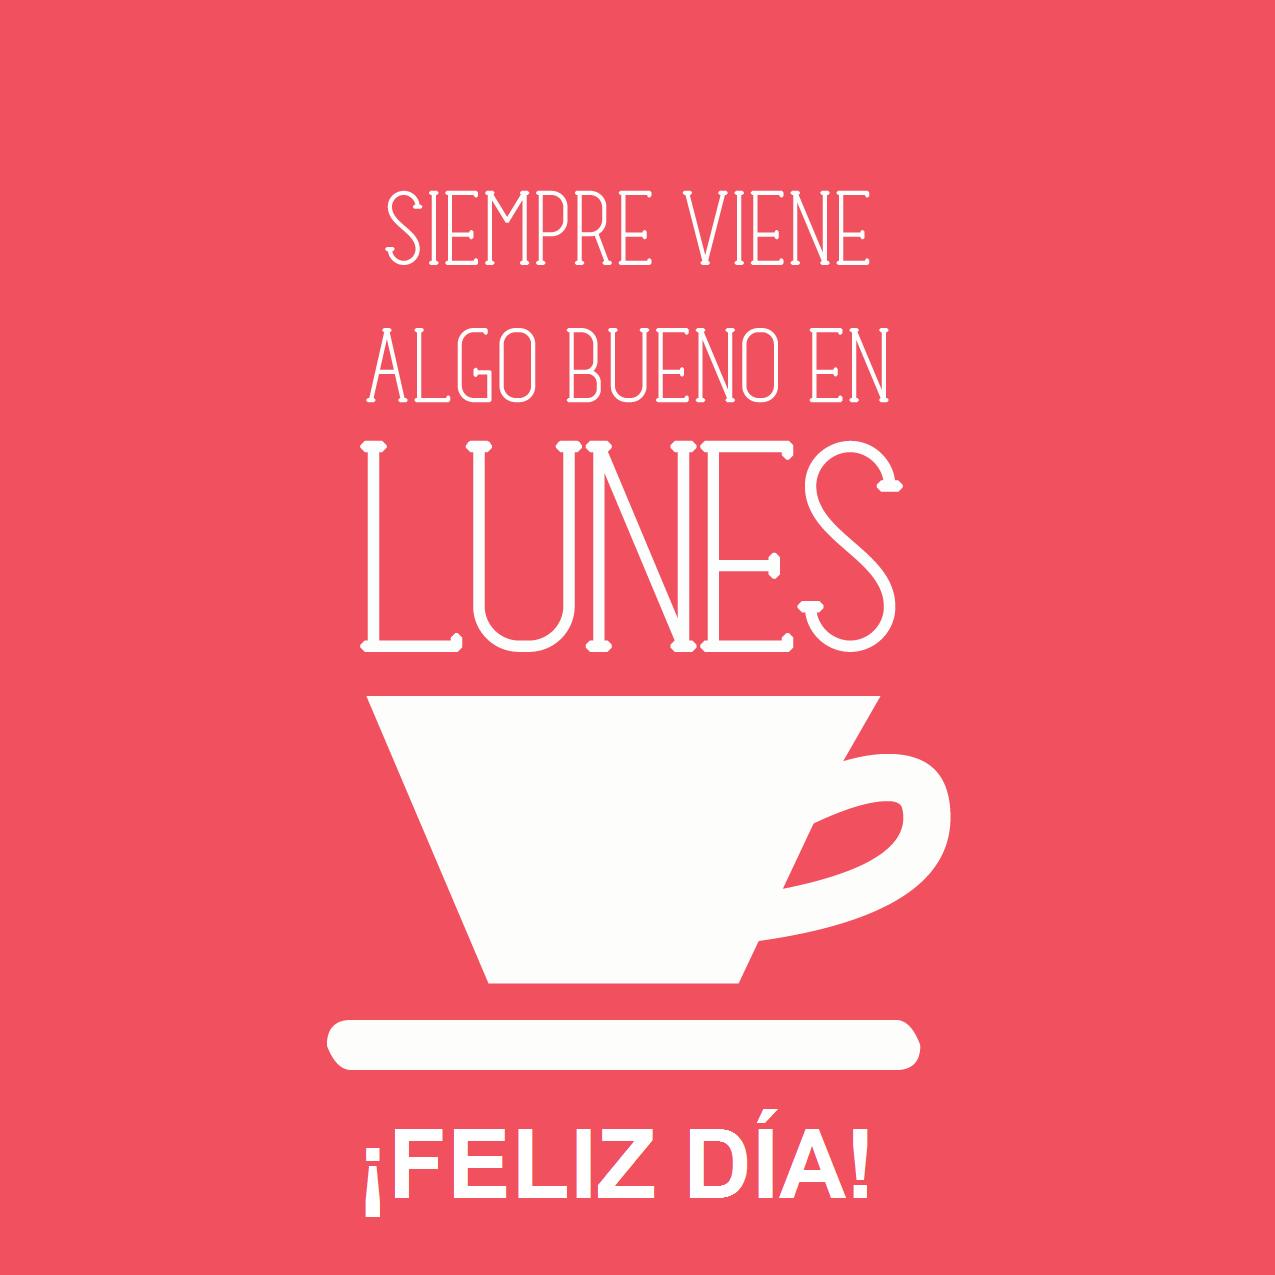 Cafe lunes